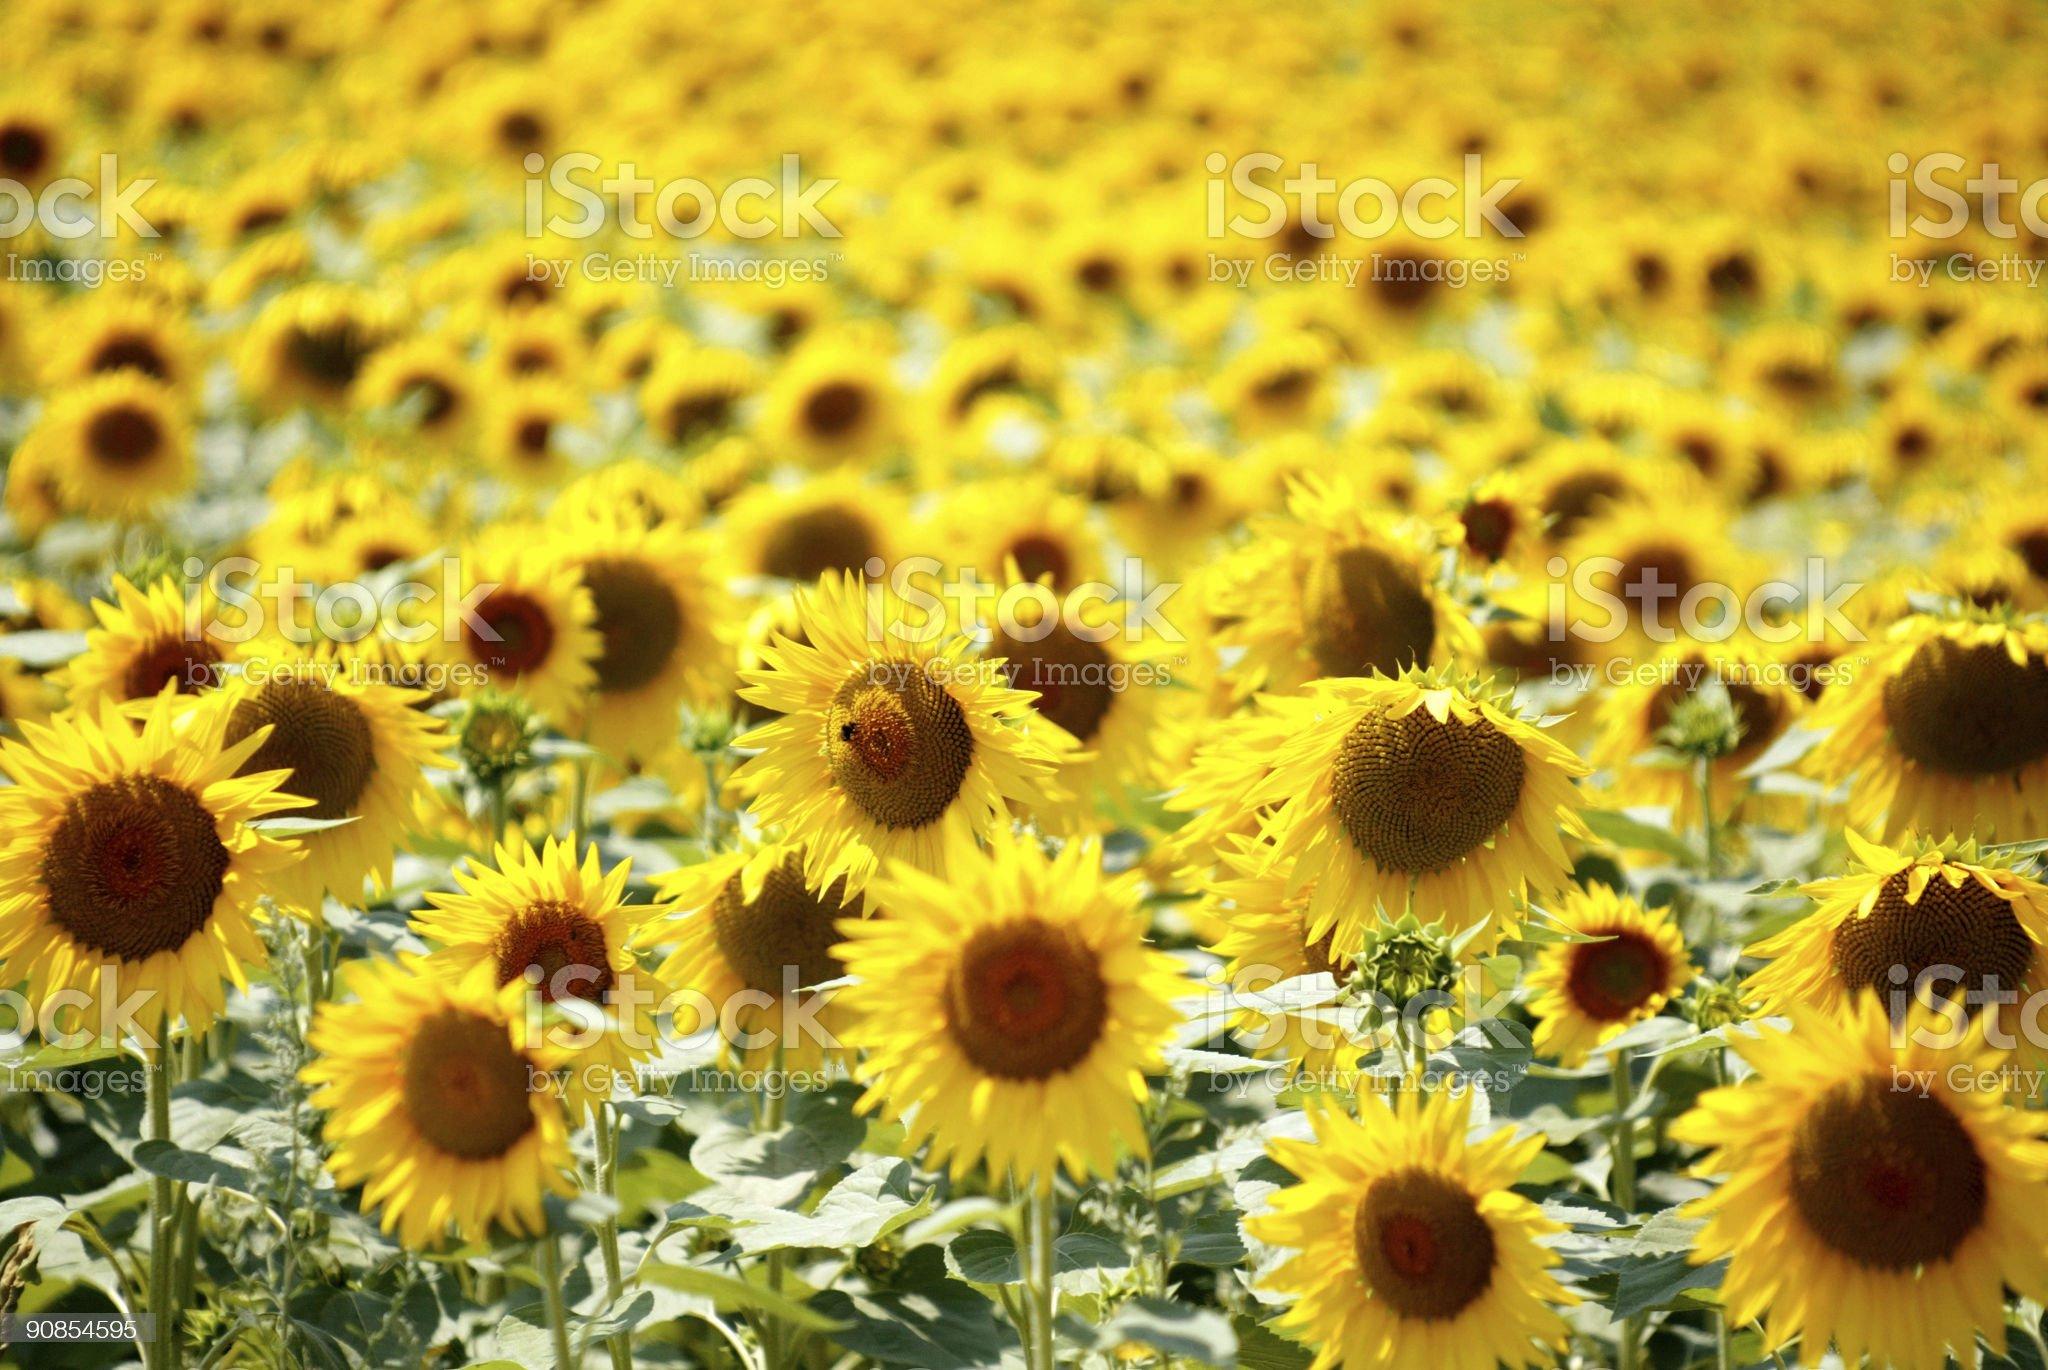 yellow field of sunflowers royalty-free stock photo